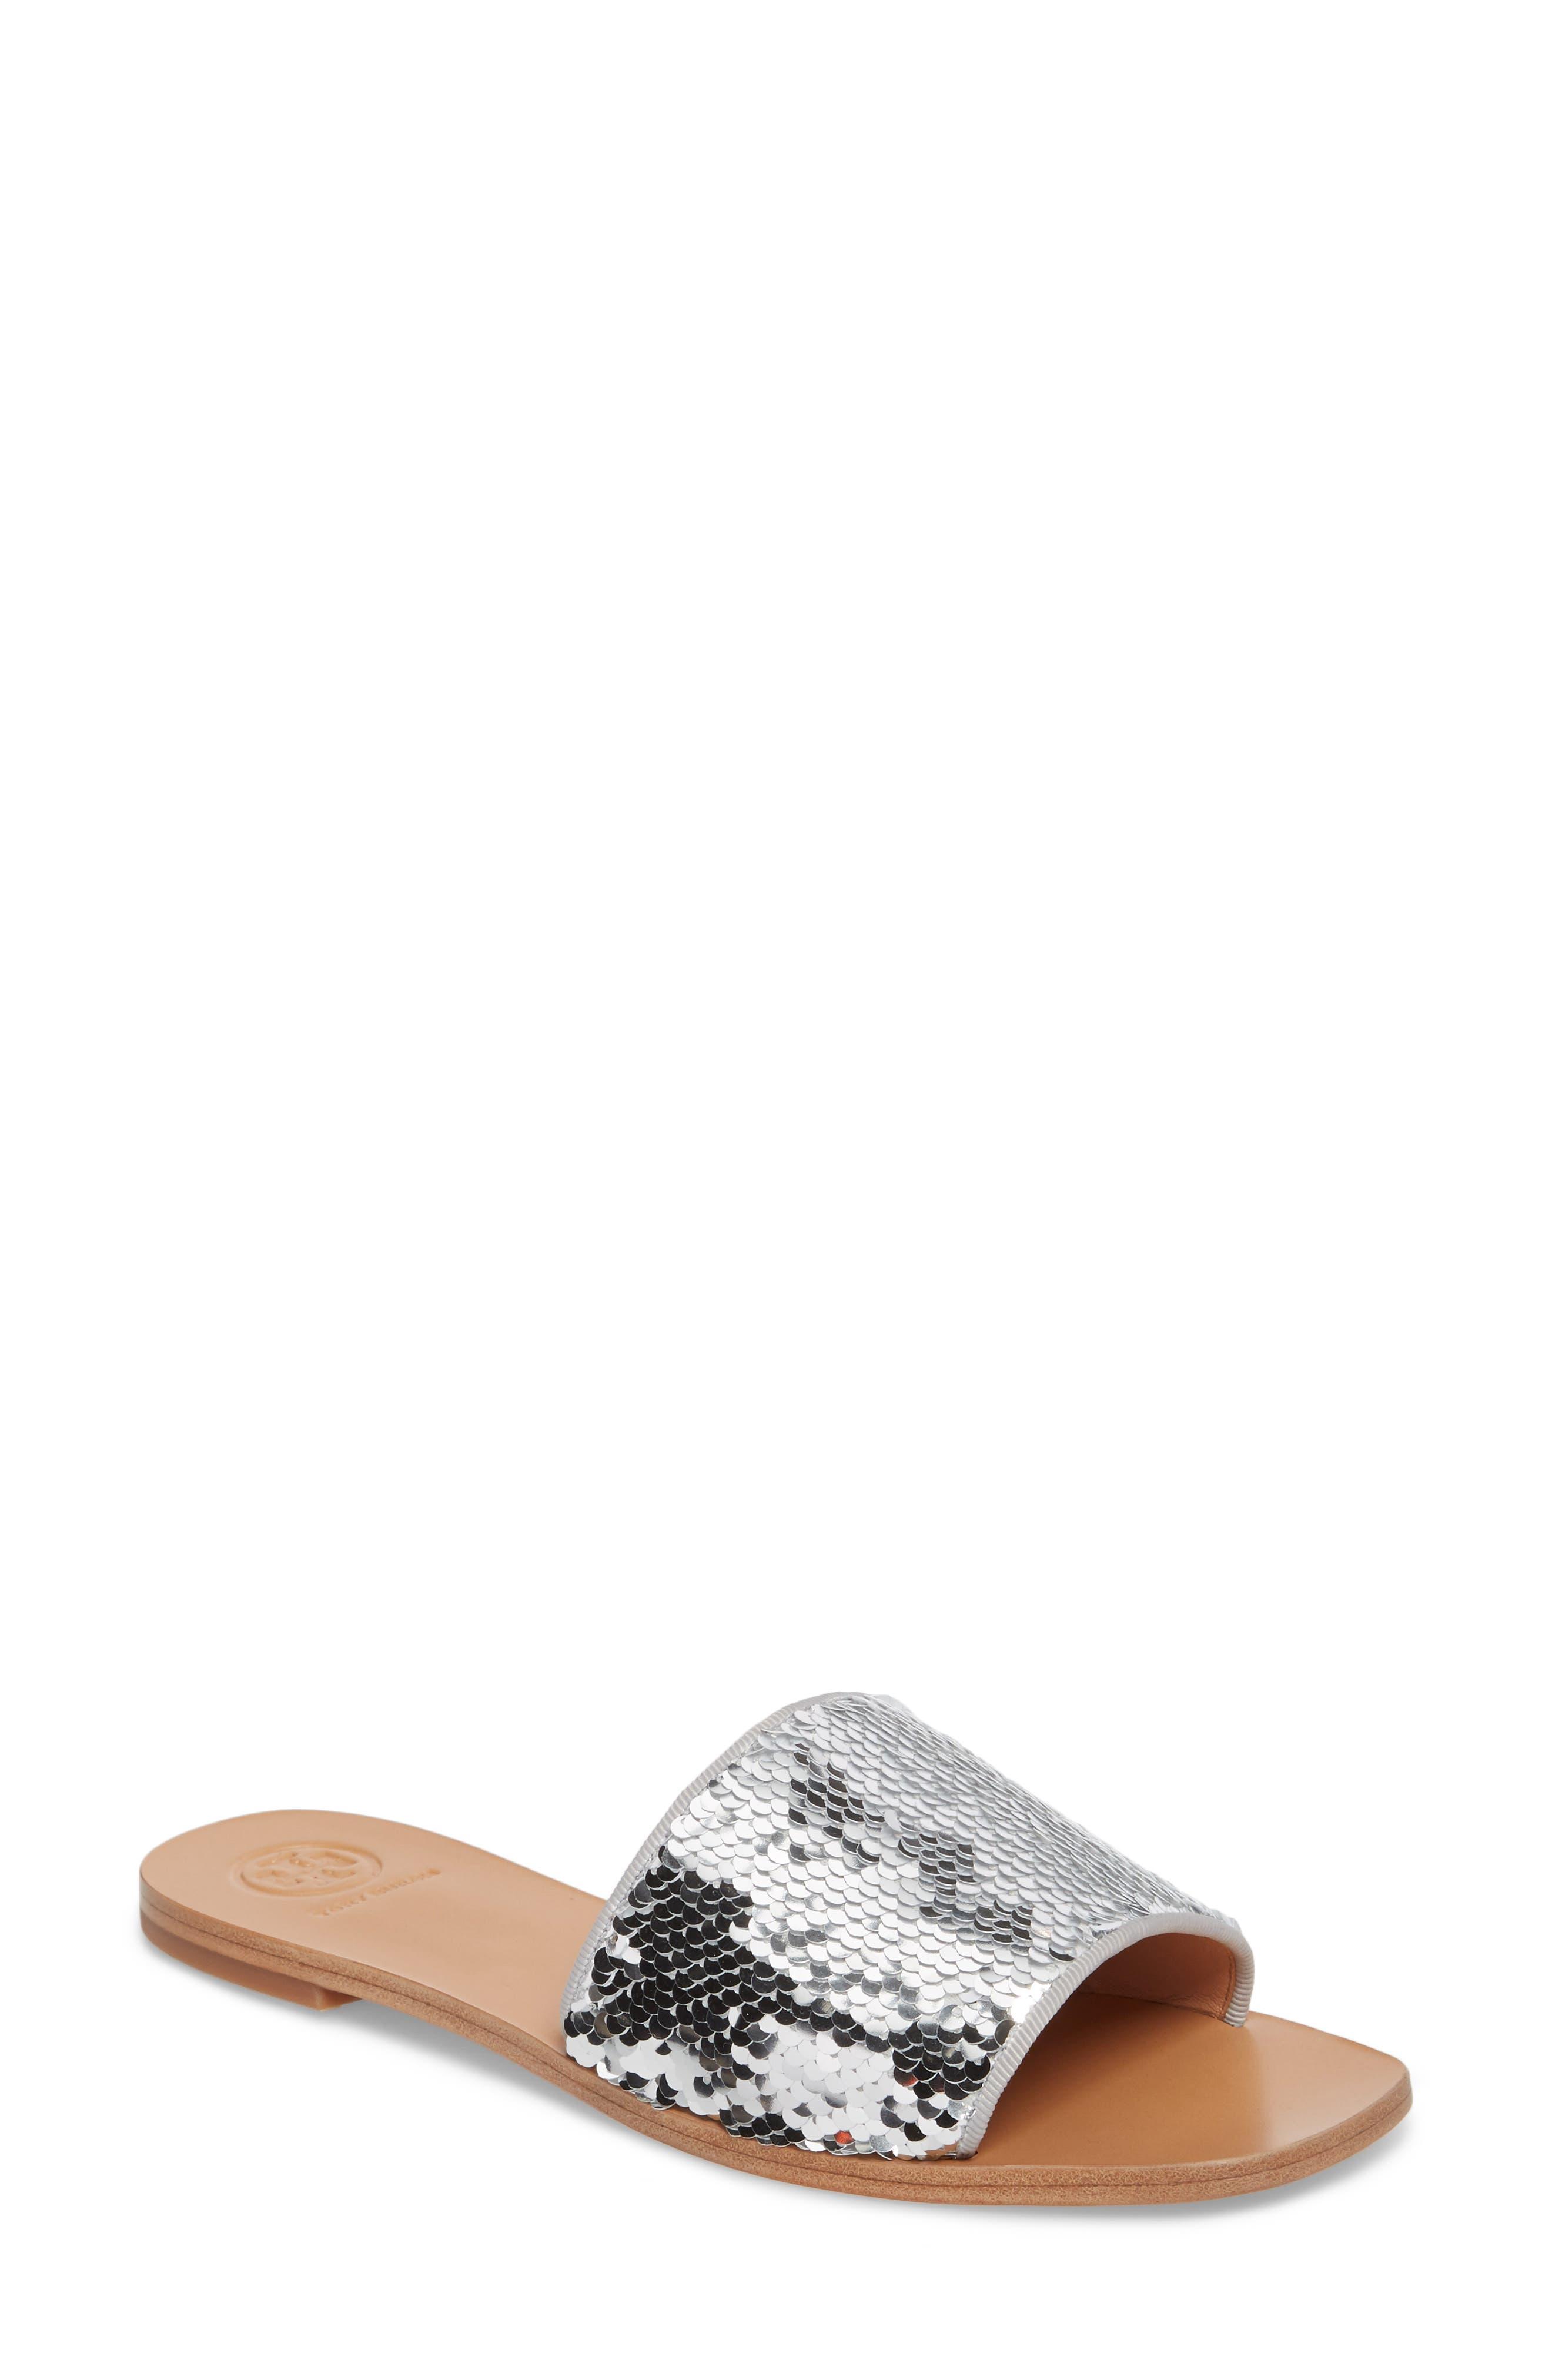 Carter Sequin Slide Sandal,                             Main thumbnail 1, color,                             Silver/ Perfect White